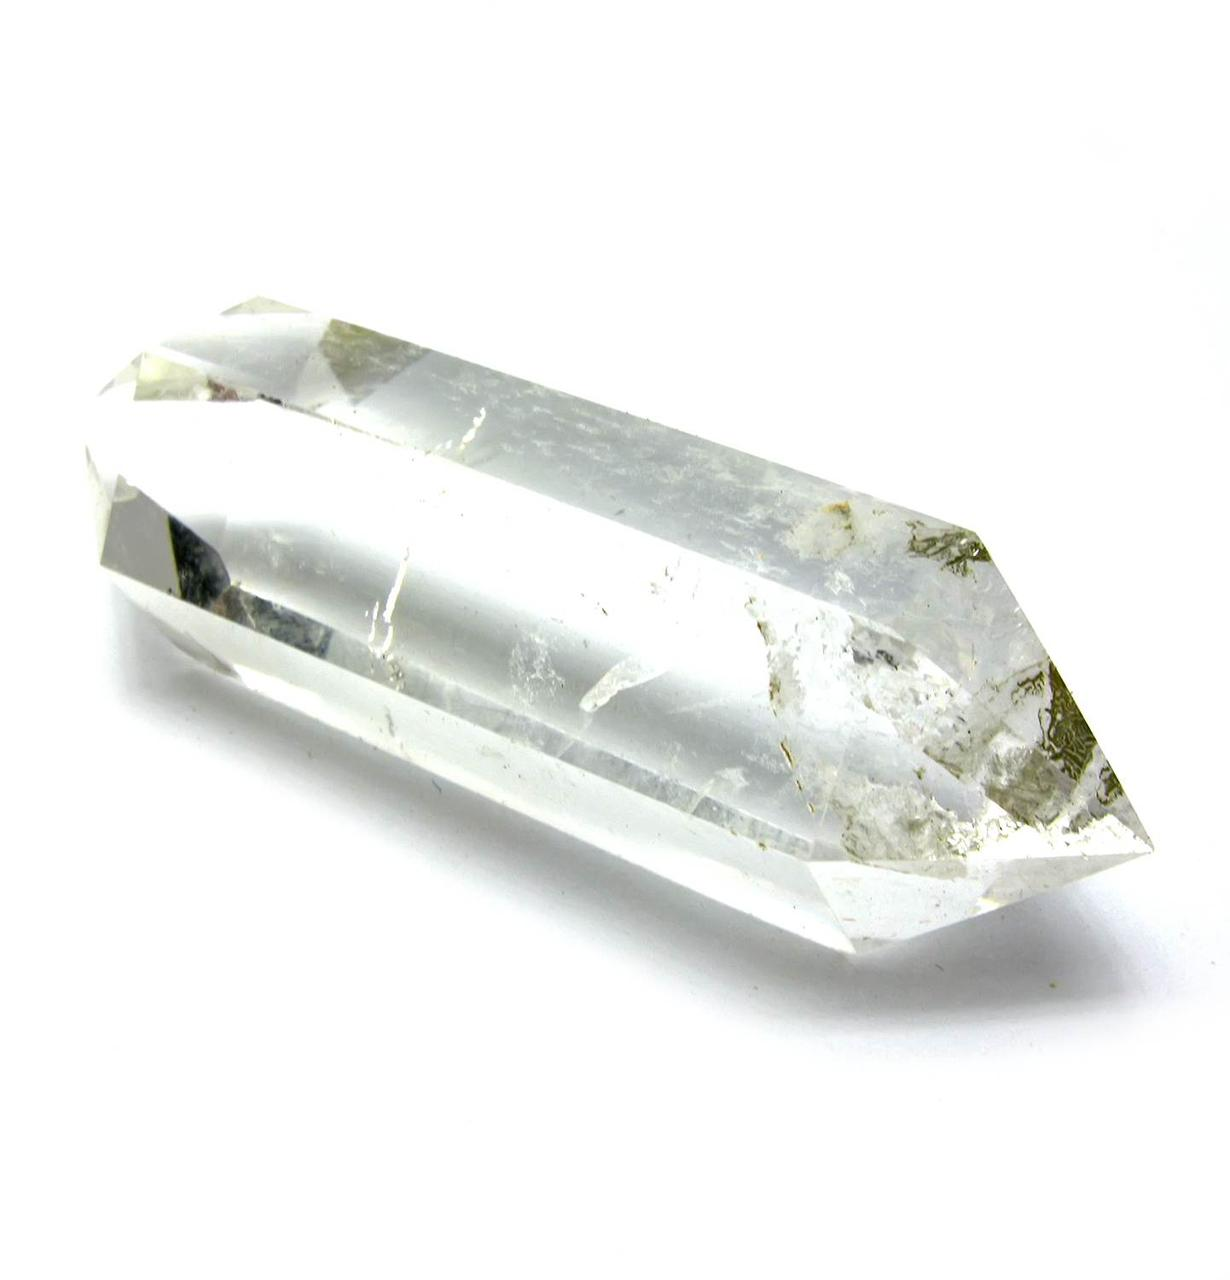 Двухголовый кристалл горного хрусталя (+-7х1 см)